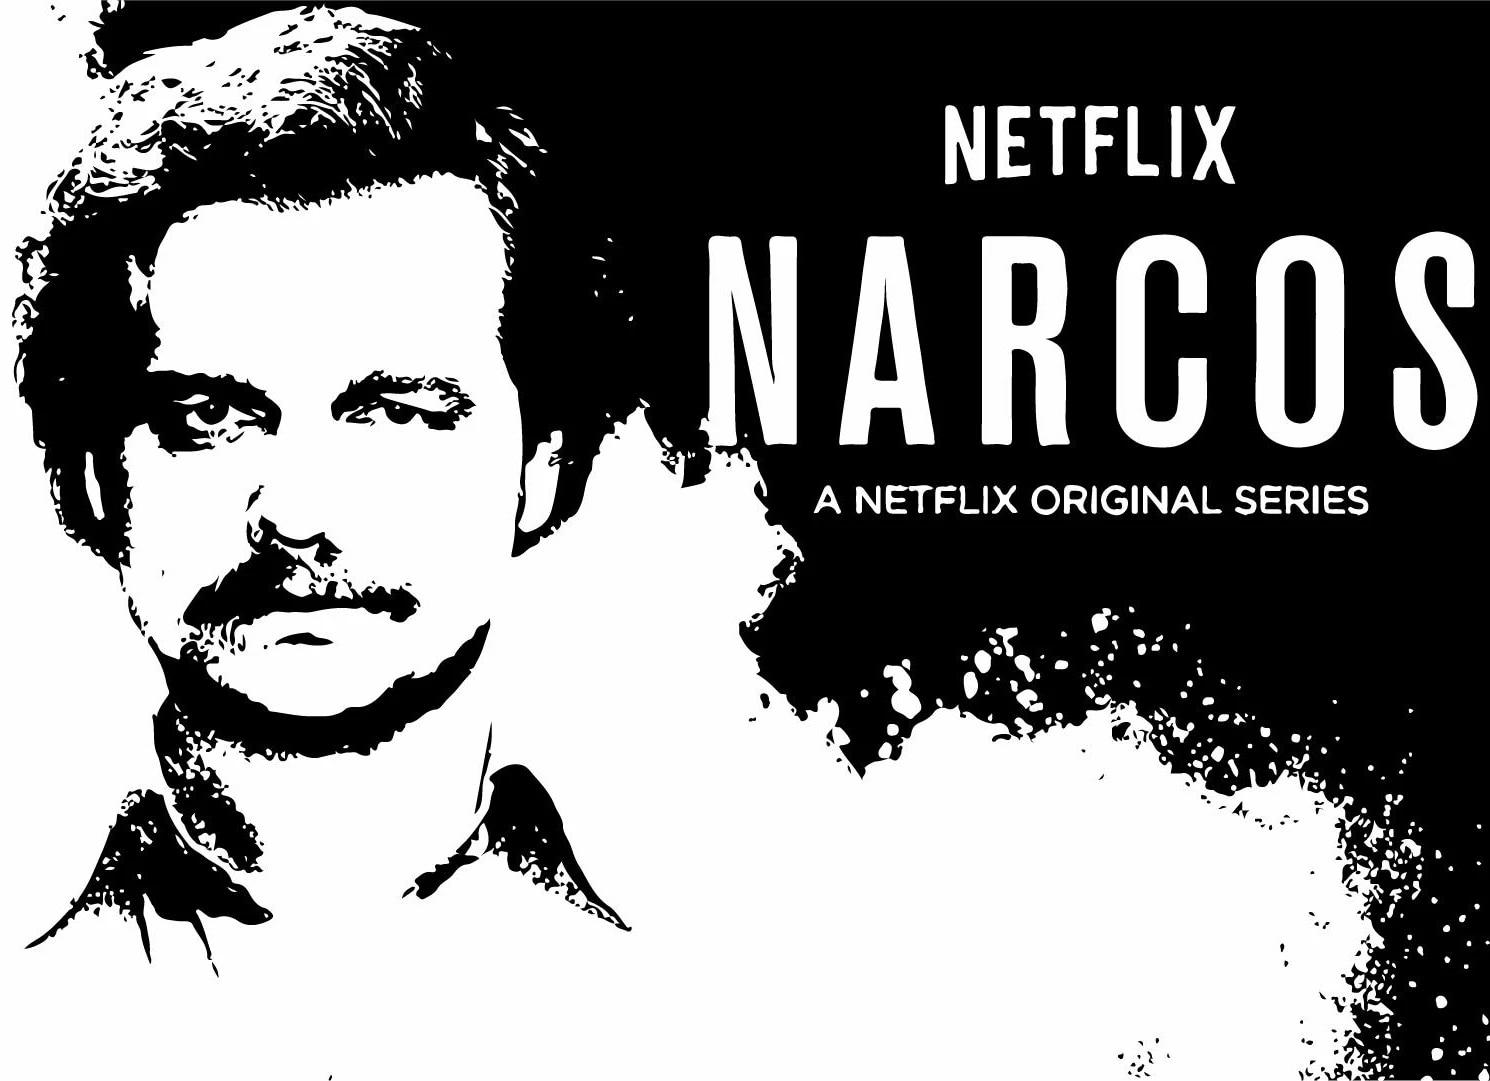 narcos kolumbien pablo escobar skizze poster klassische retro vintage kraft leinwand diy wand aufkleber home bar poster decor geschenk